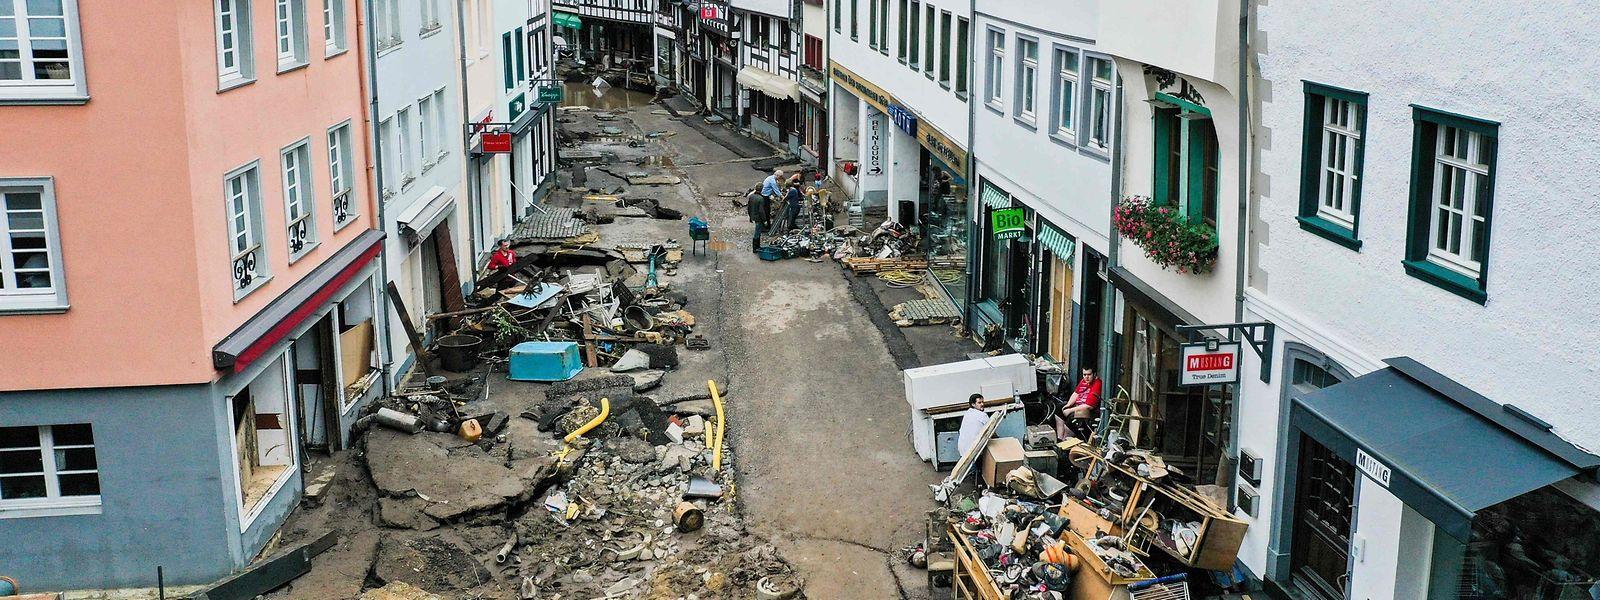 Unwetterschäden in Bad Münstereifel in Nordrhein-Westfalen.